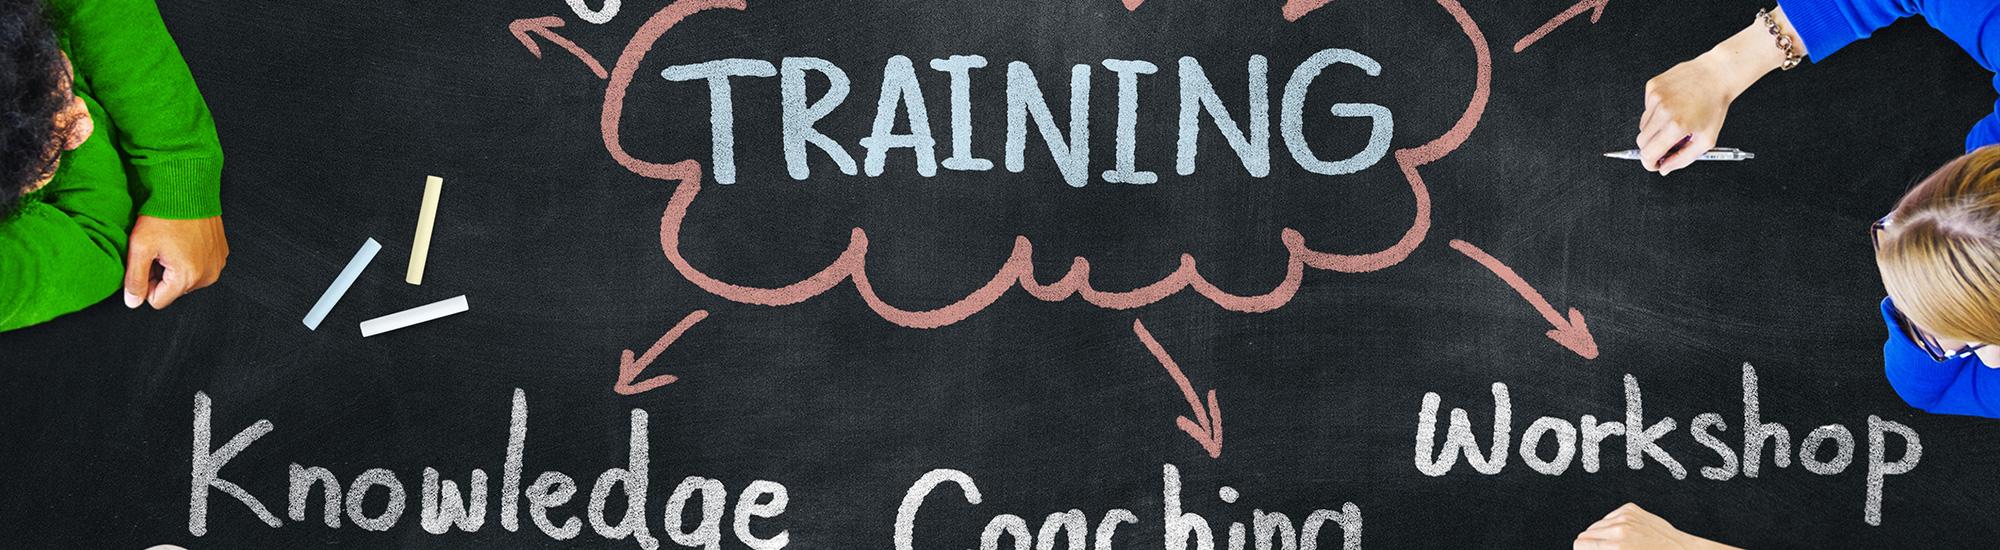 slider_training2